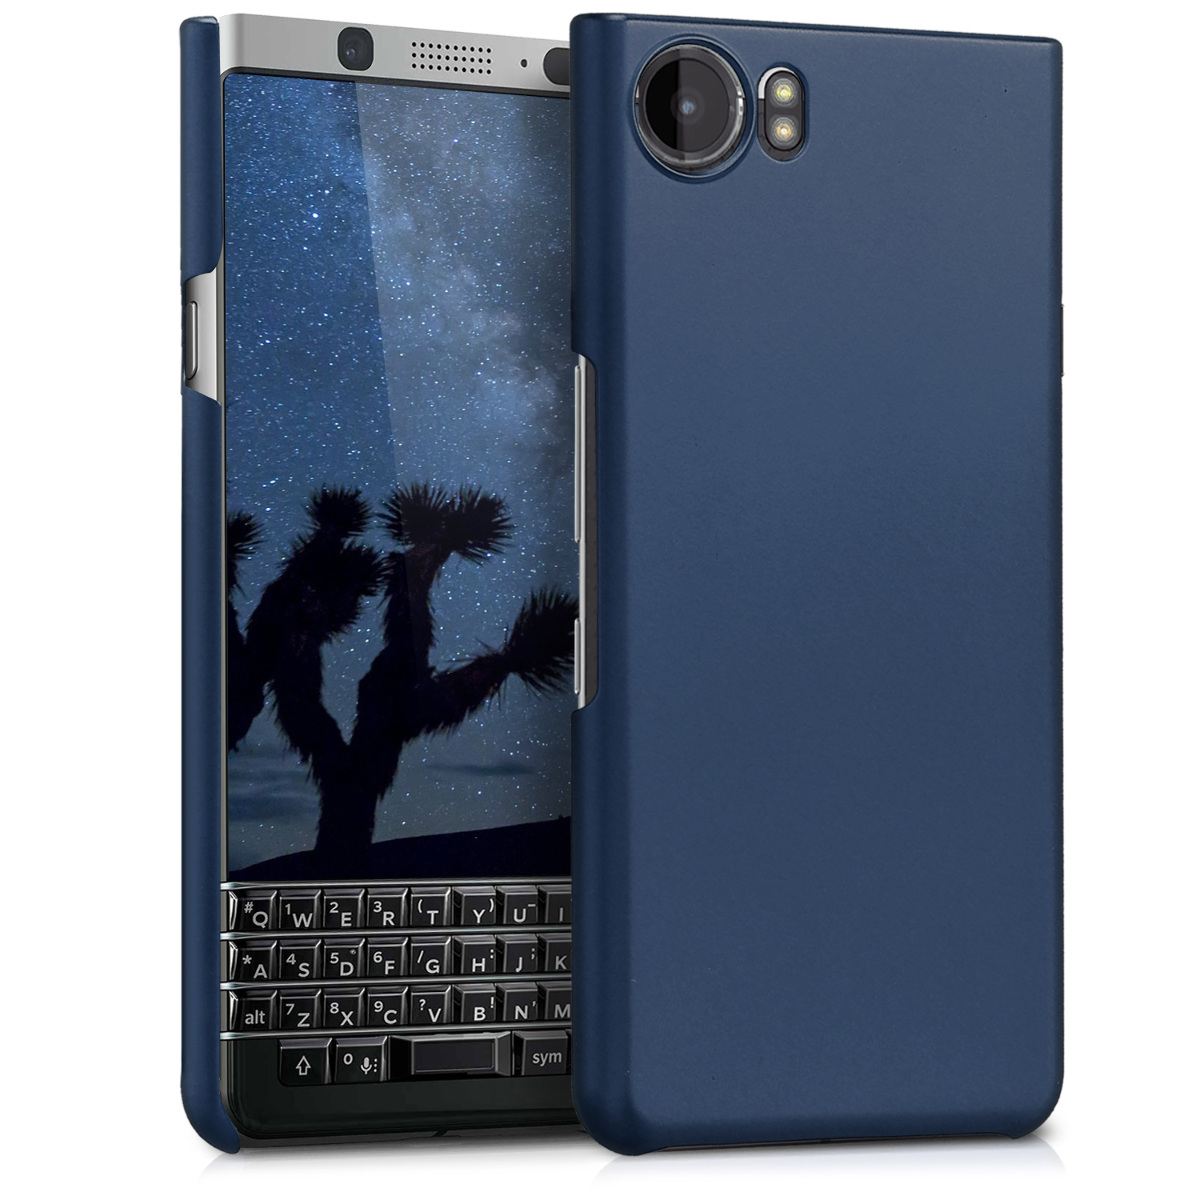 KW Slim Anti-Slip Cover - Σκληρή Θήκη Blackberry KeyOne - Metallic Blue (43693.64)